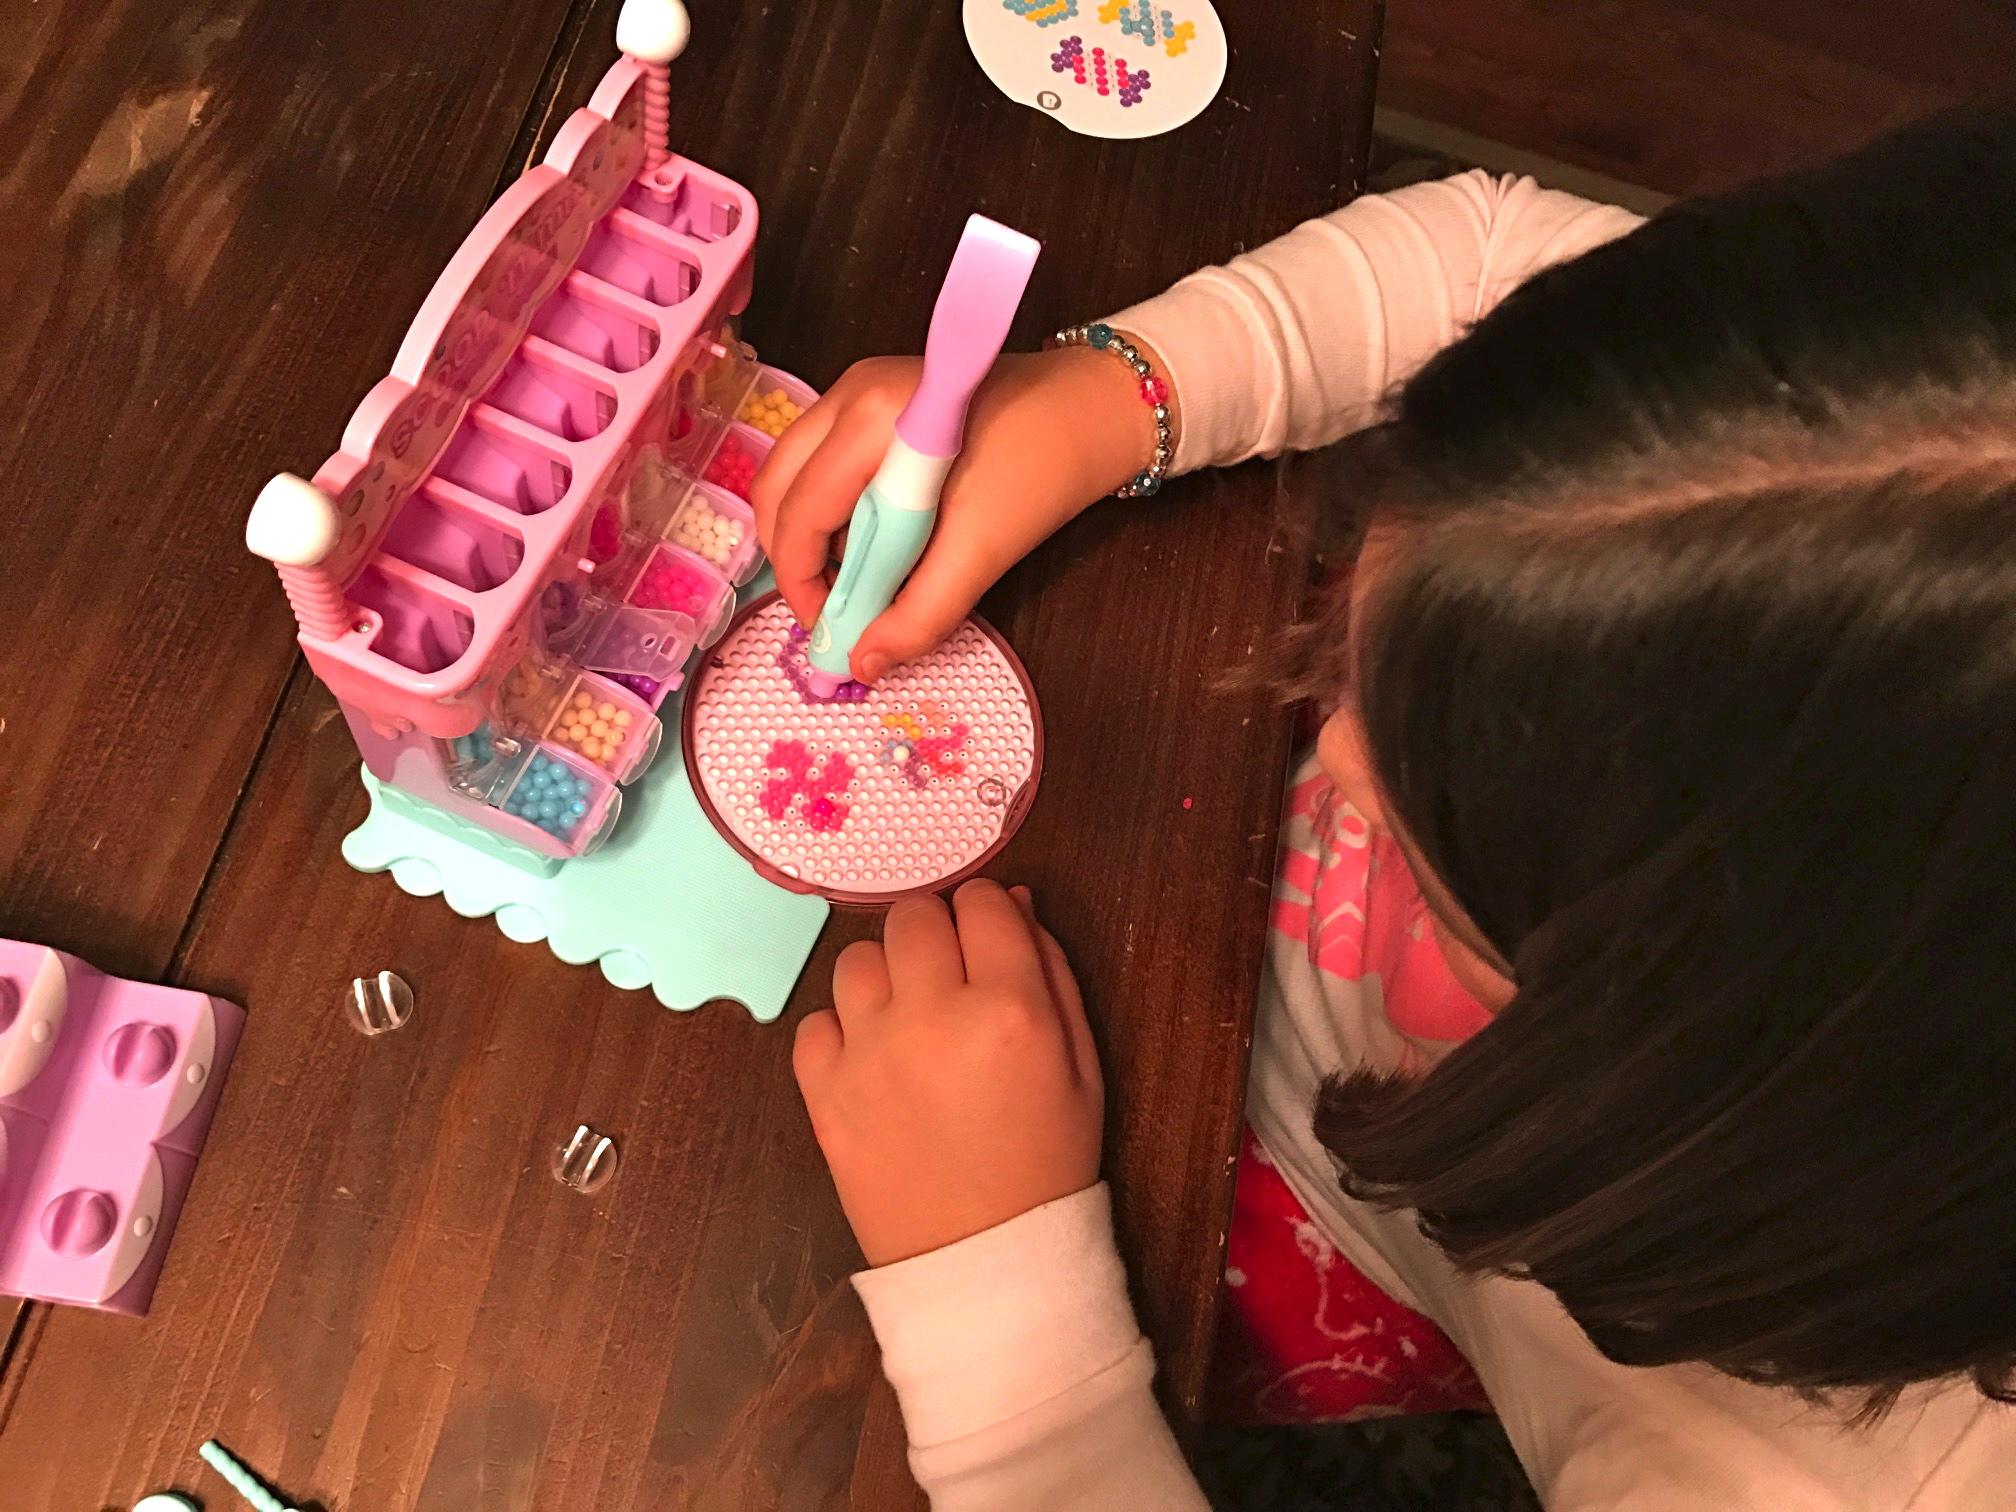 Girl Beados Toys : Fun with beados by moose toys girl gone mom